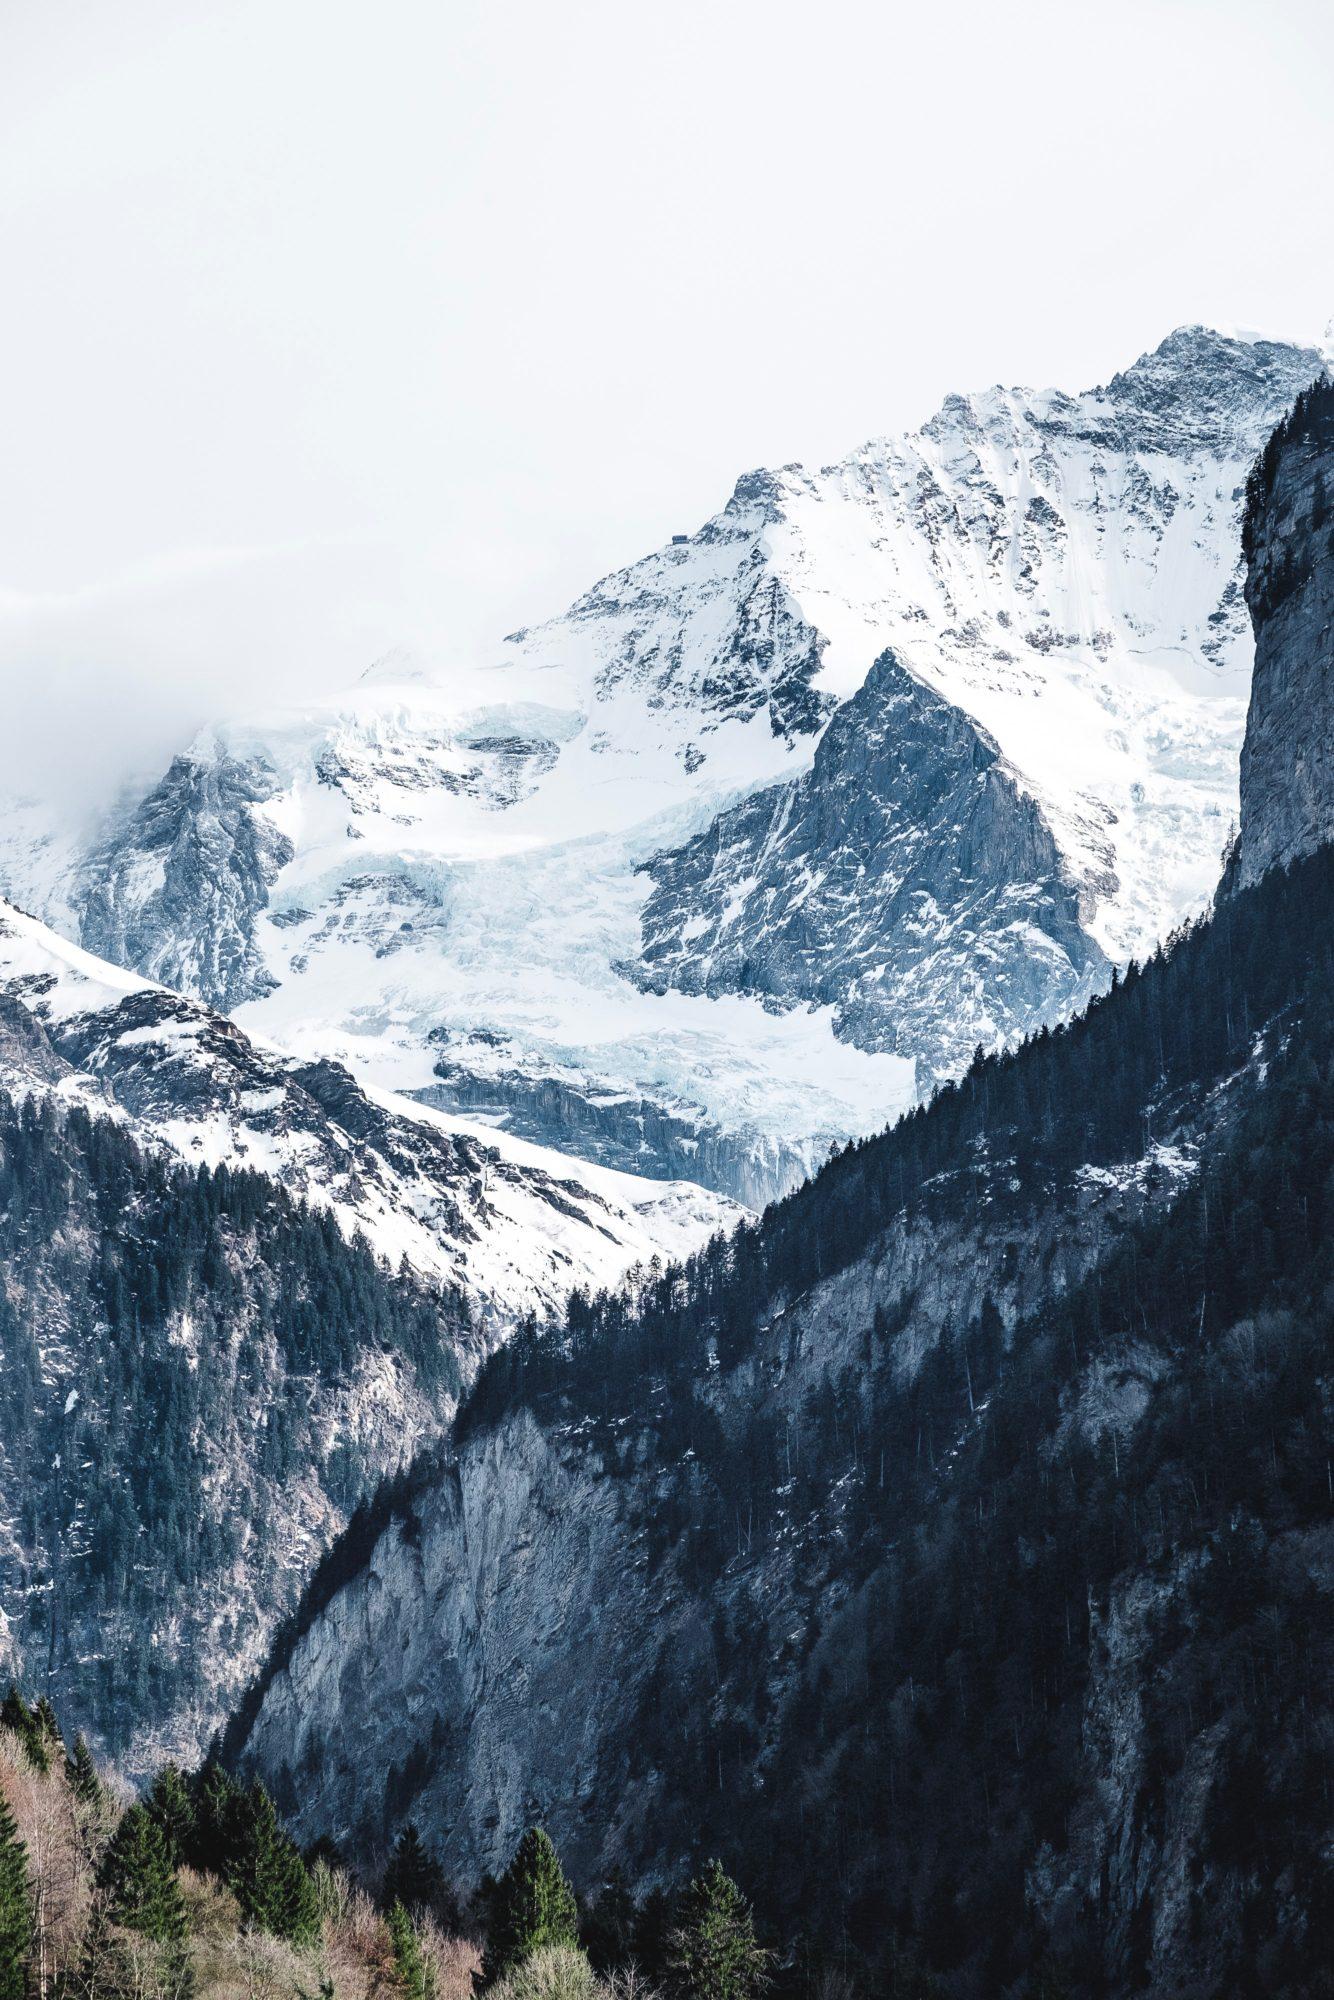 Interlaken, Best Mountain Towns In Europe